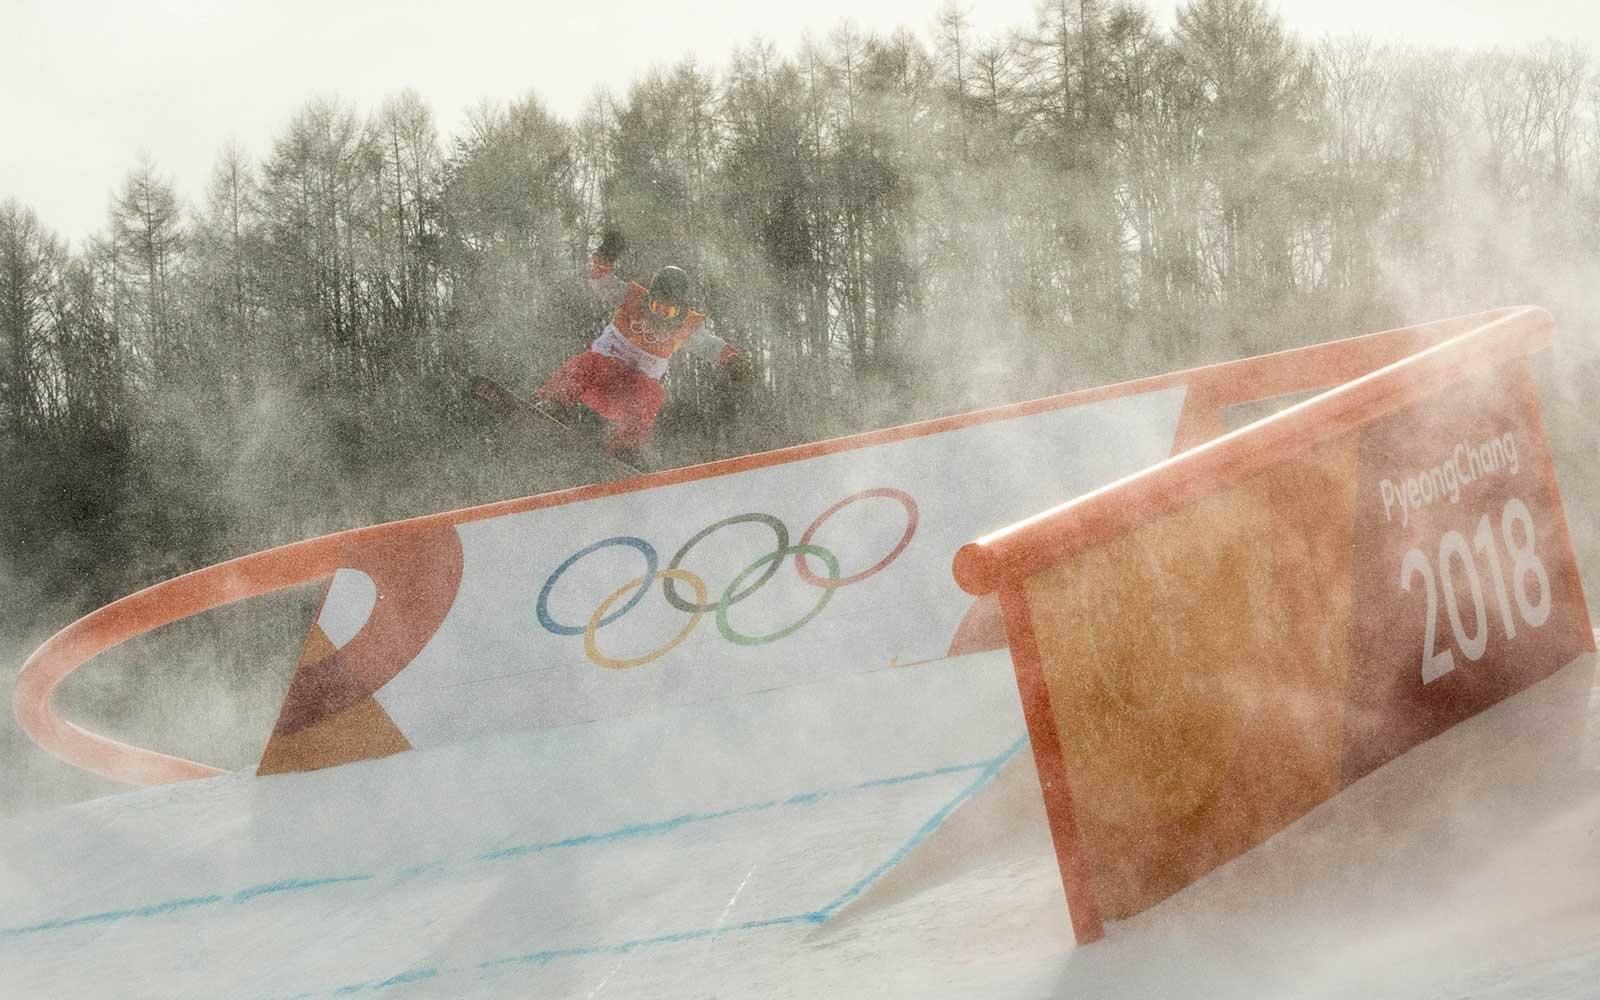 Winter Olympics winds